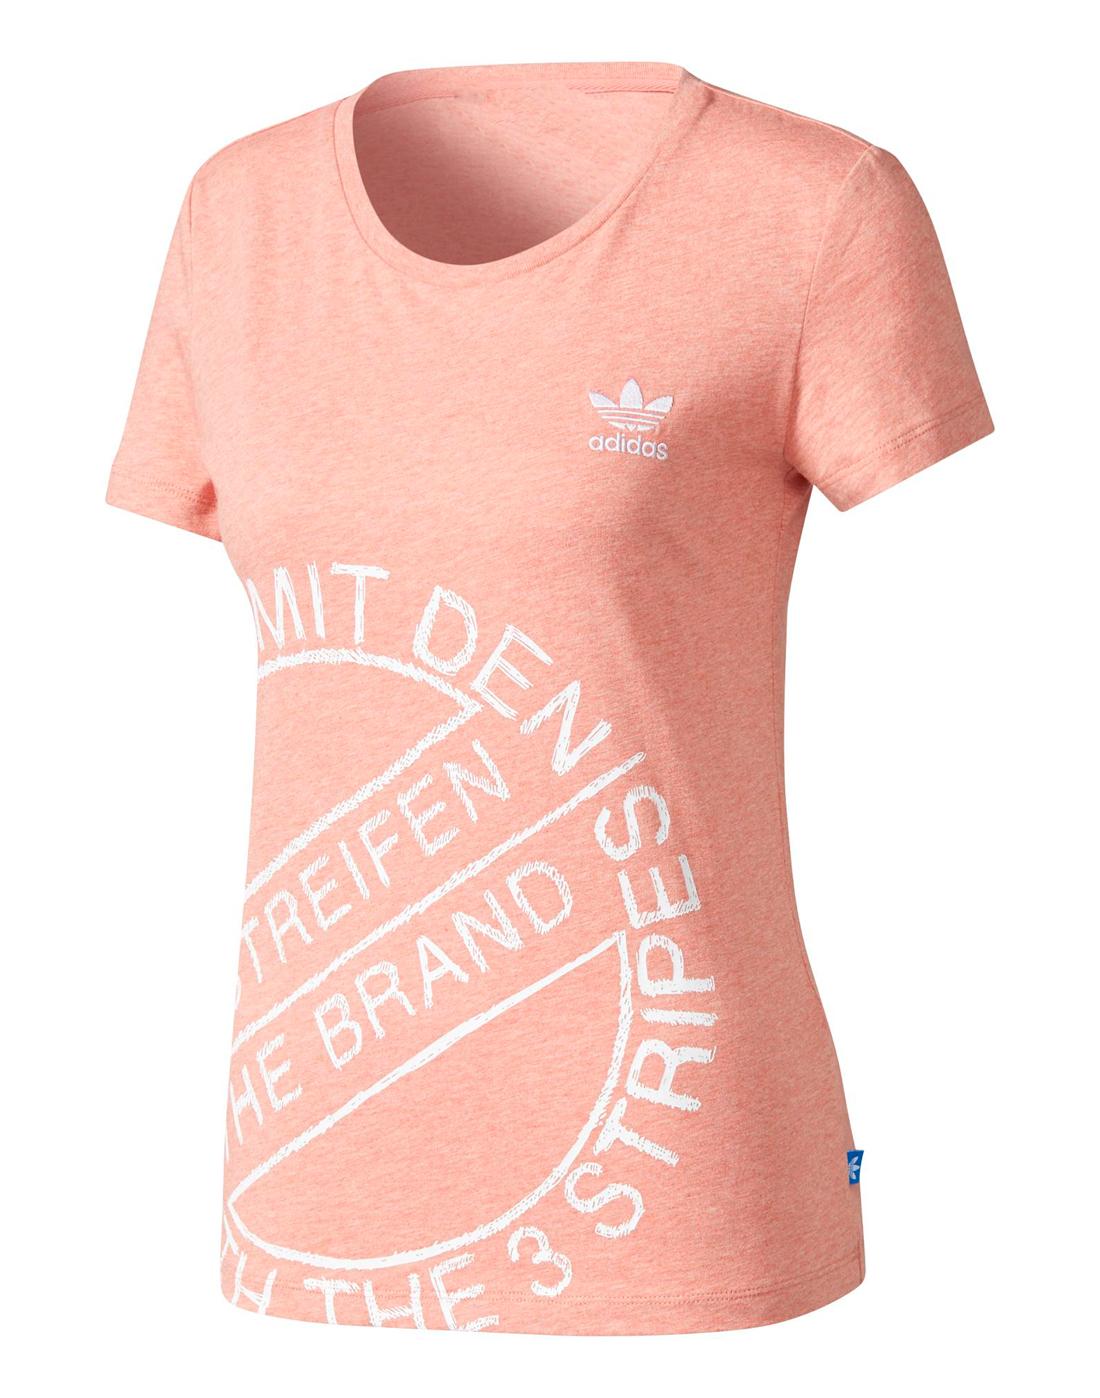 497ee4b8872 adidas Originals Womens T-Shirt | Life Style Sports